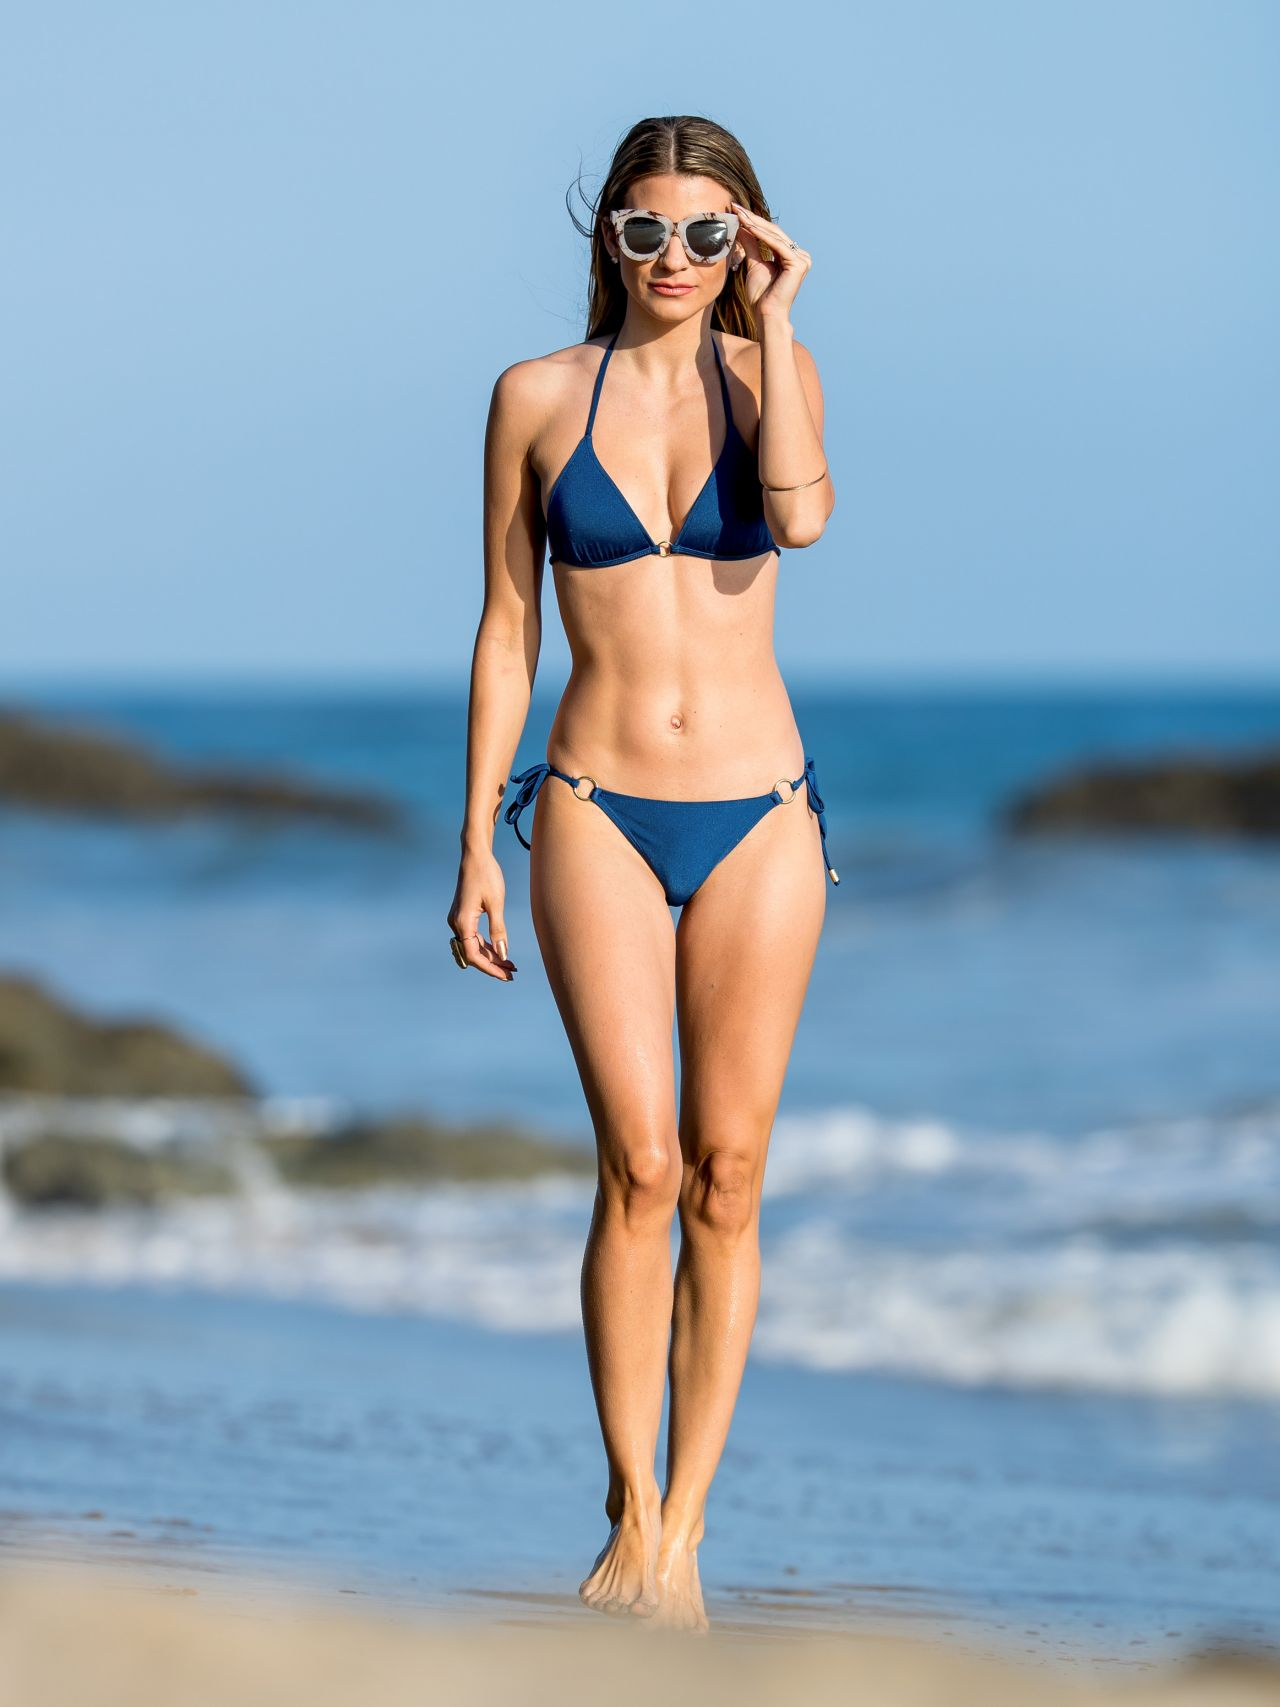 Rachel McCord in a Bikini at the Beach in Los Angeles 5292016